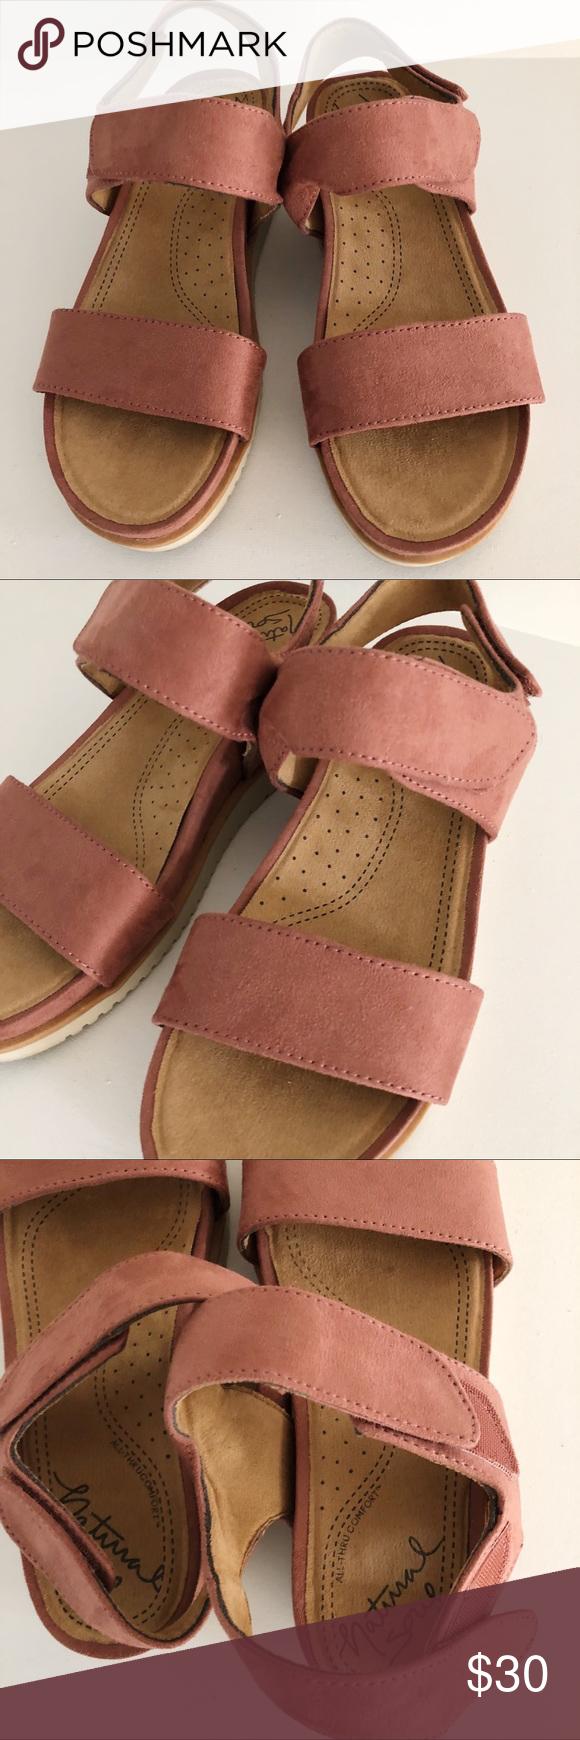 fb980aa5cdb4 Natural Soul Mauve Kaila Sandals Natural Soul Kaila sandals with mauve  color suede straps - 2